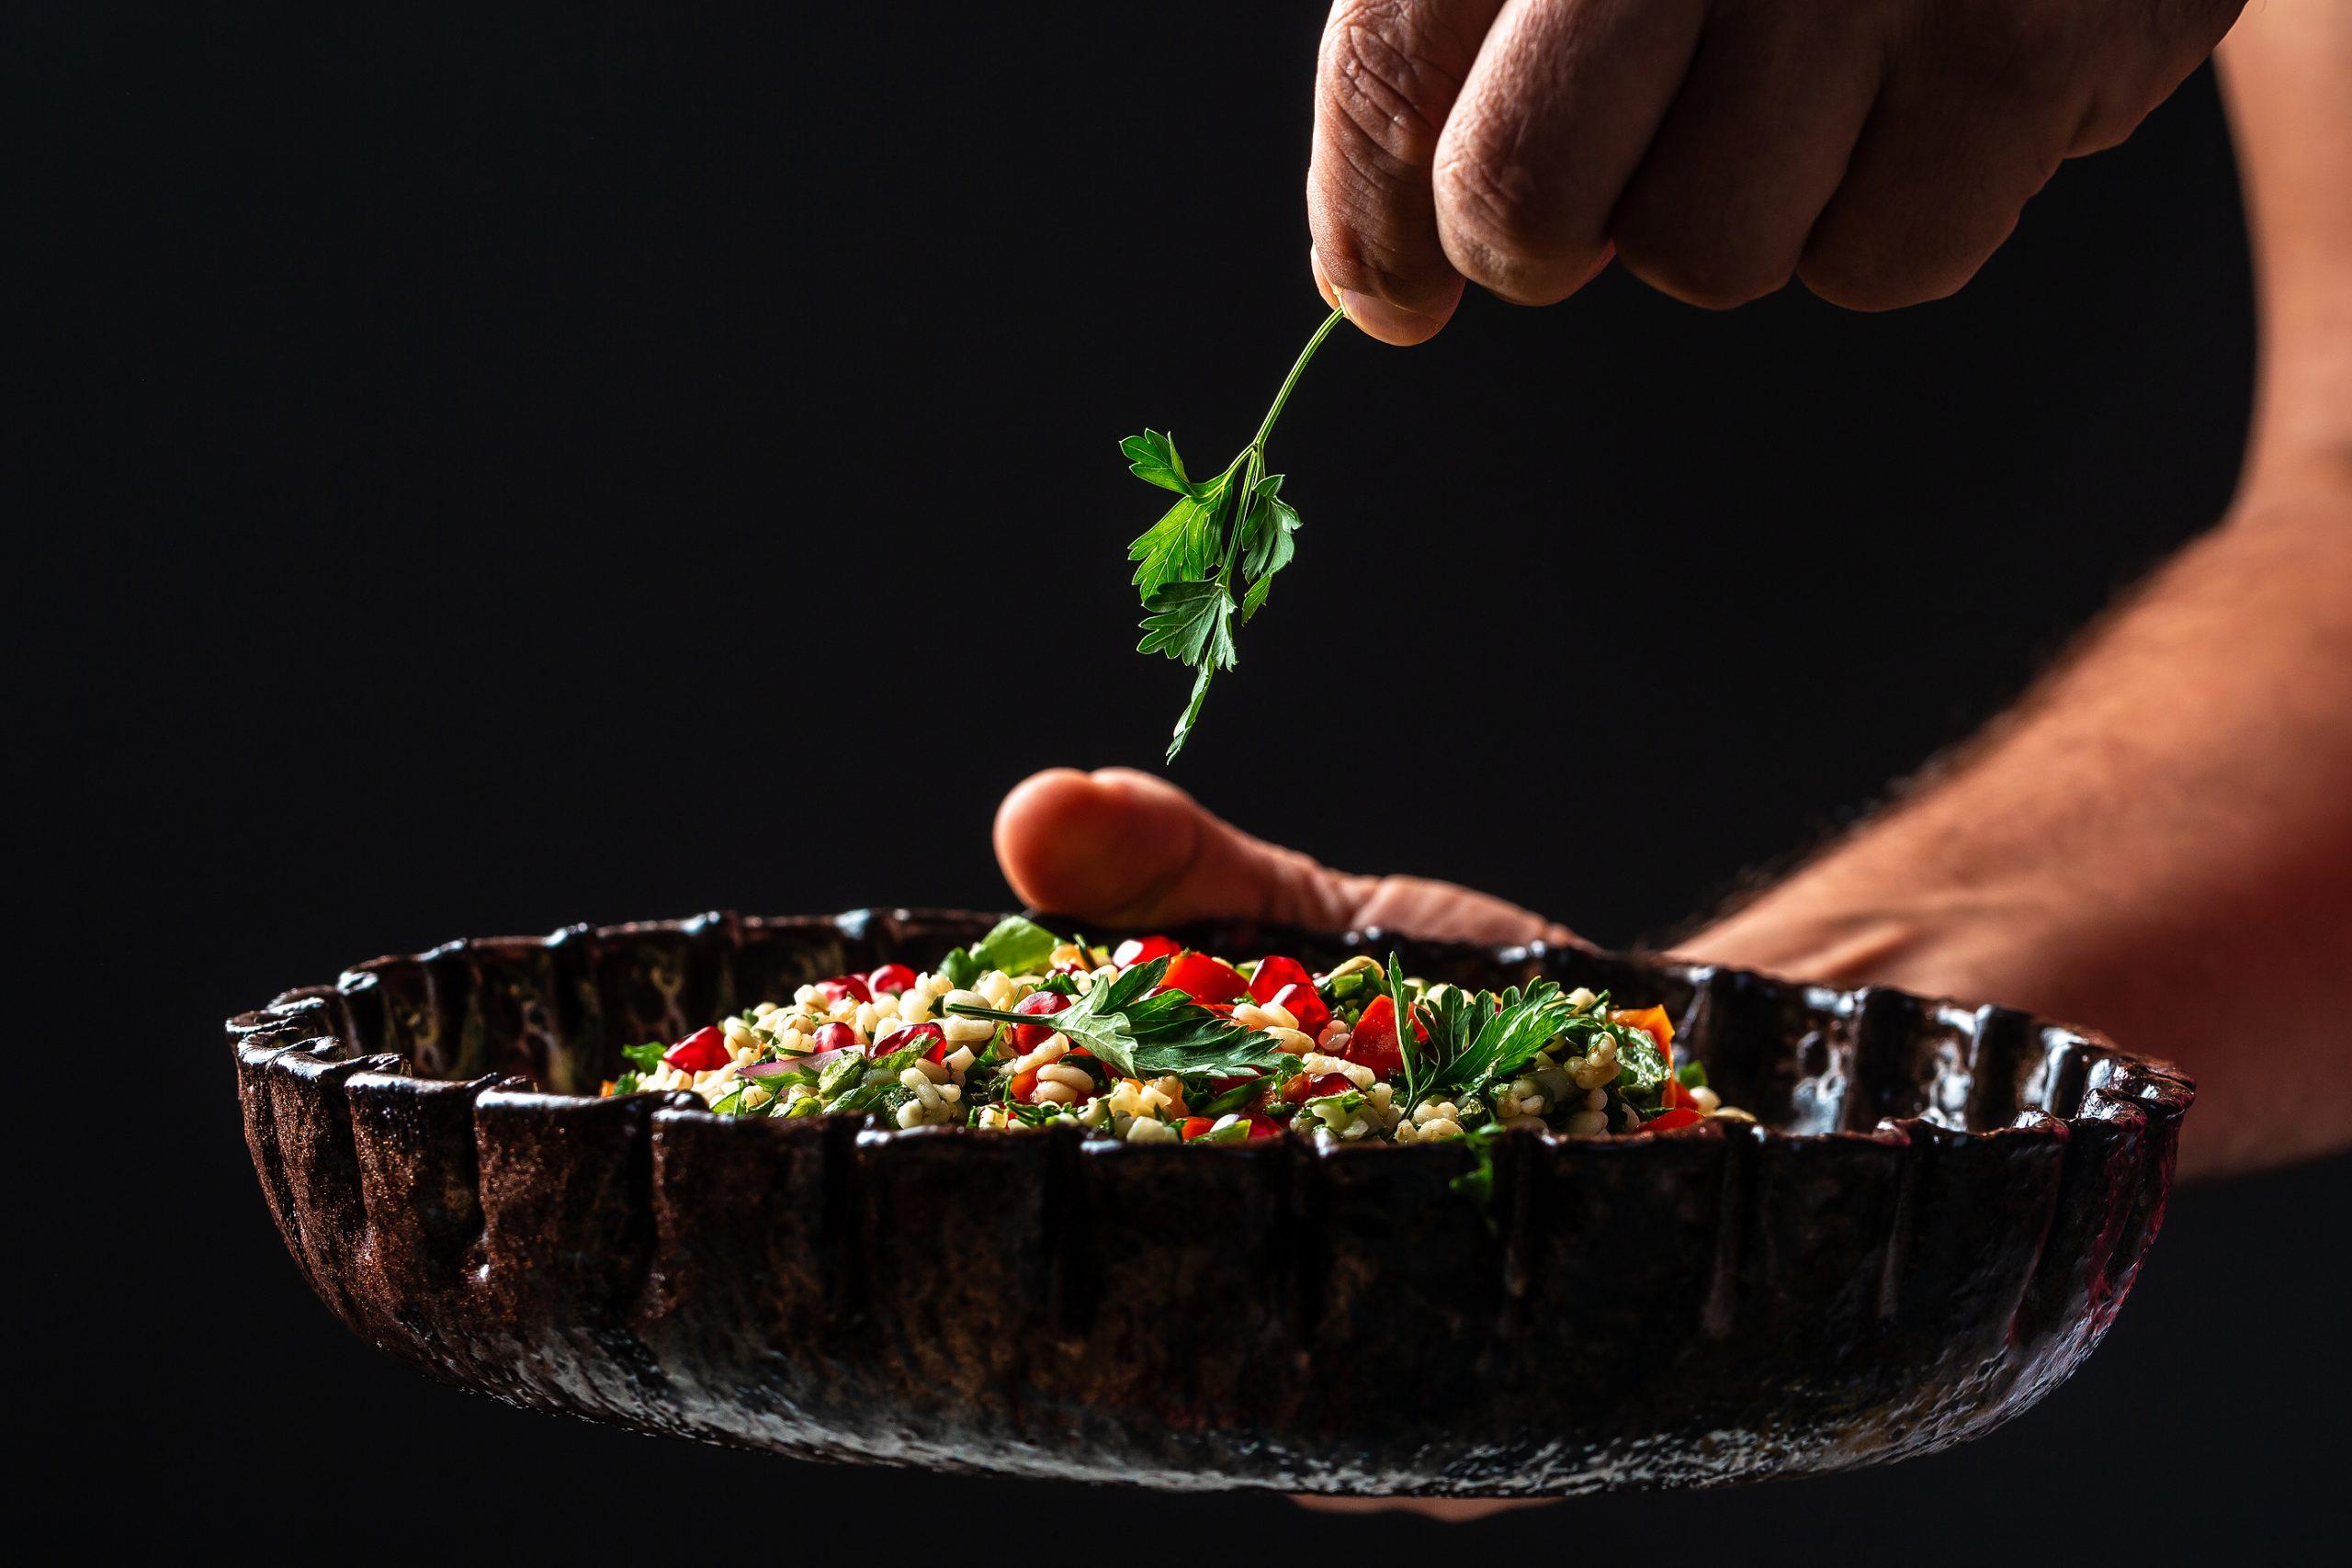 [RECIPE] Make-ahead millet tabouli salad with garlic-mint dressing